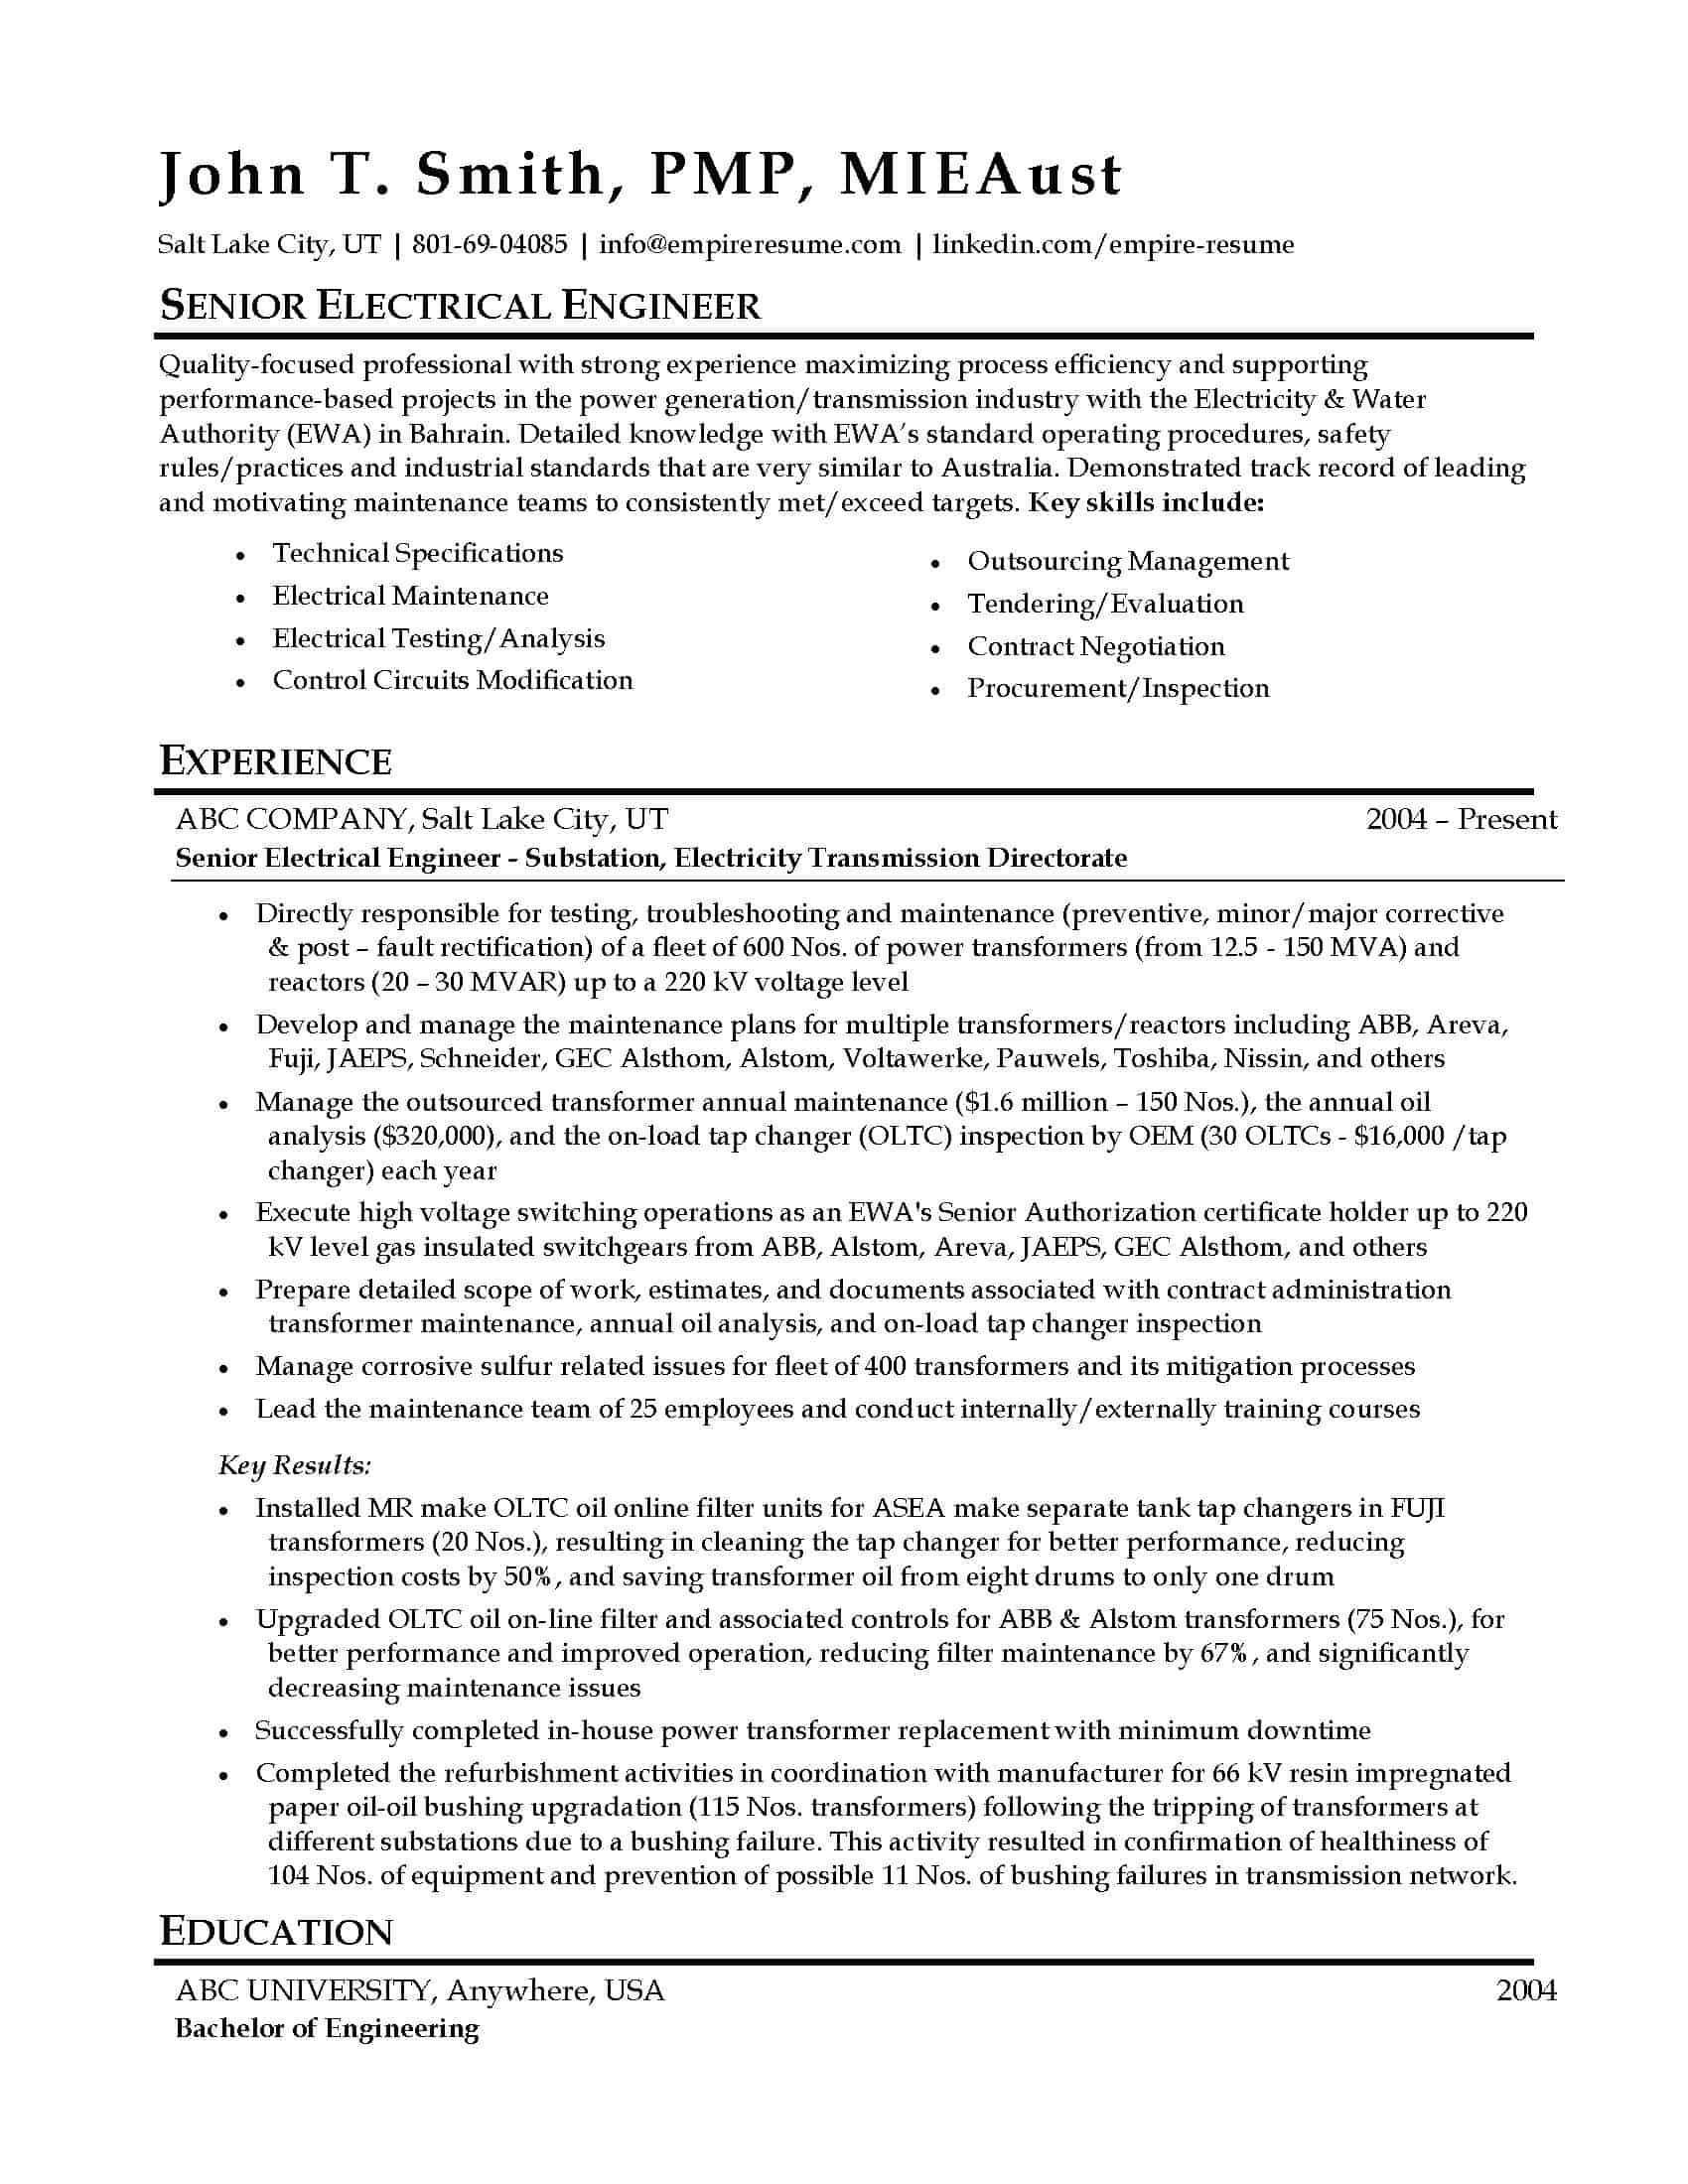 Professional Resume Examples Salt Lake City Empire Resume